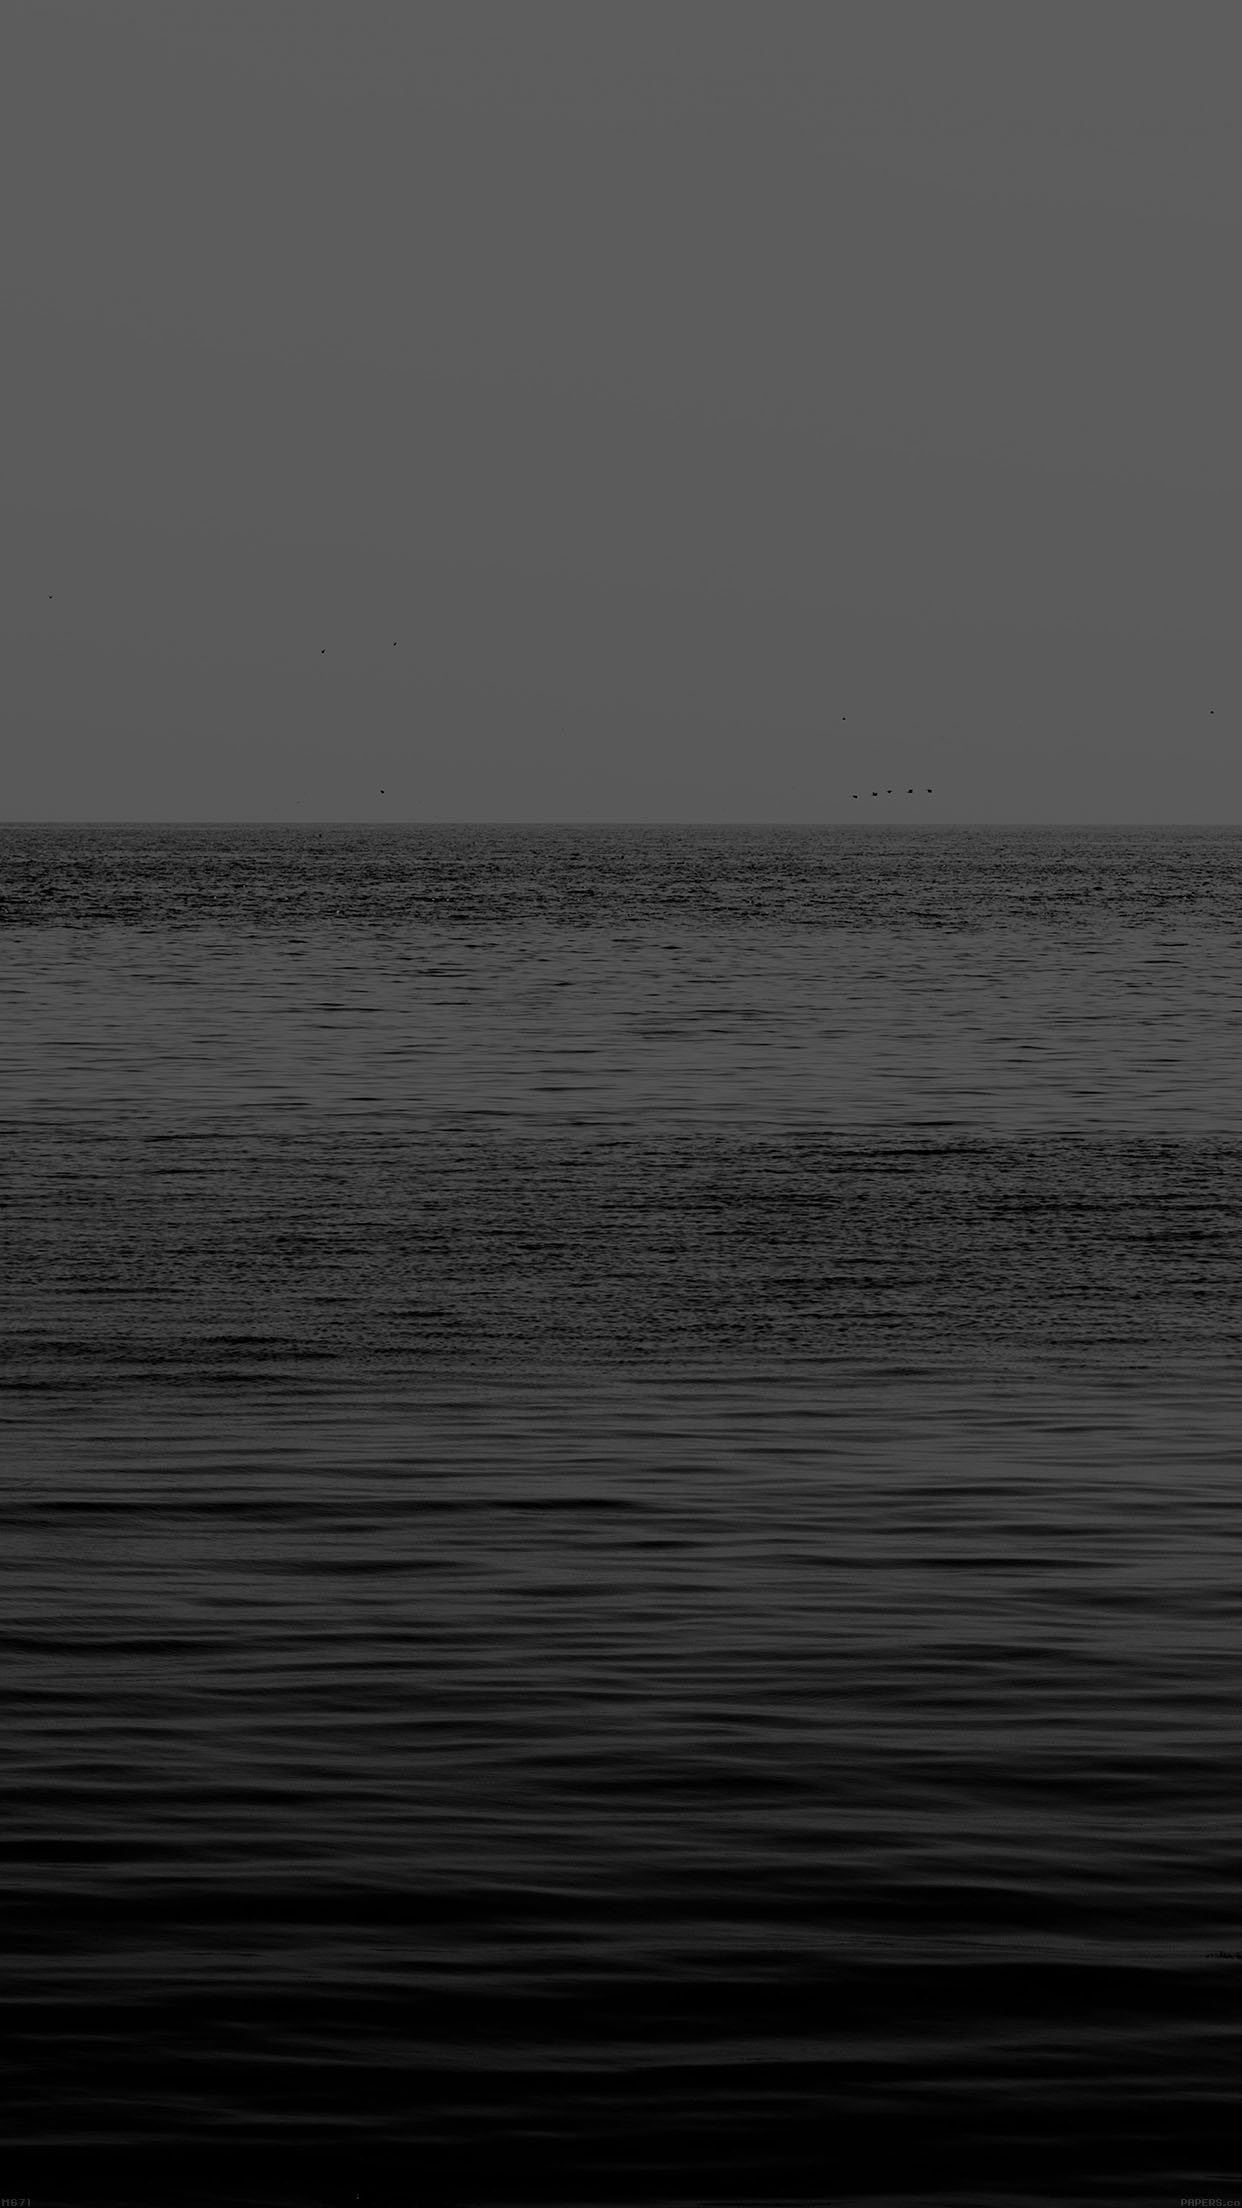 Music Mg Wallpaper Hd Mg71 Black Sea Ocean Flat Nature Papers Co